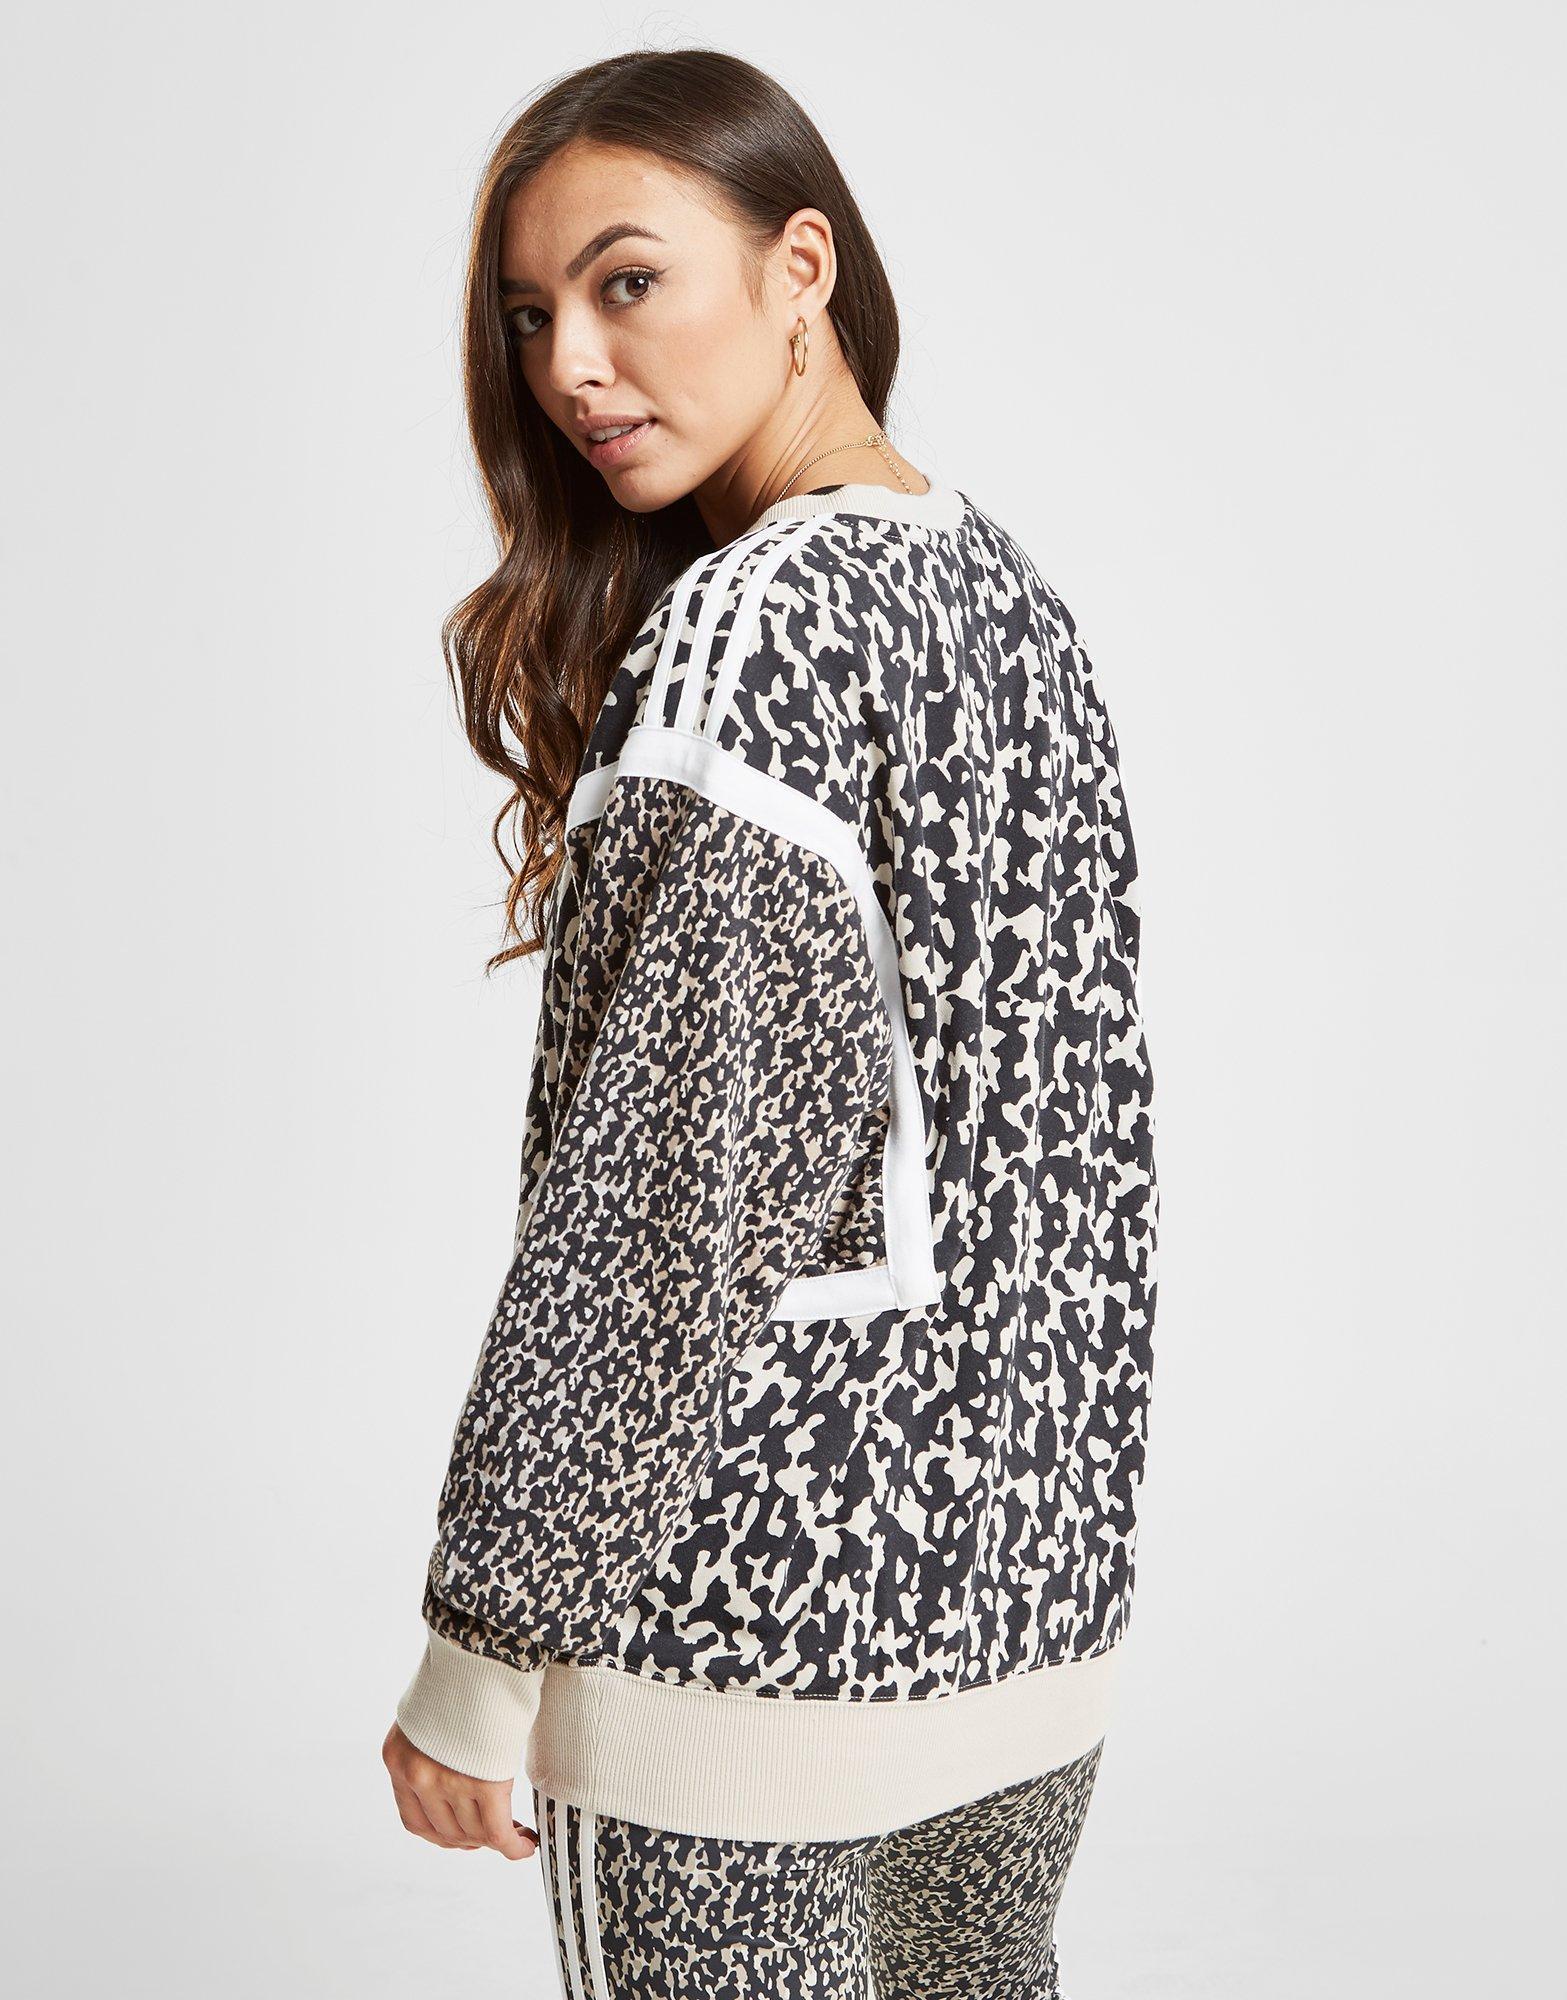 f1c9b5520ee8b Lyst - Adidas Originals 3-stripes Crew Sweatshirt in Black